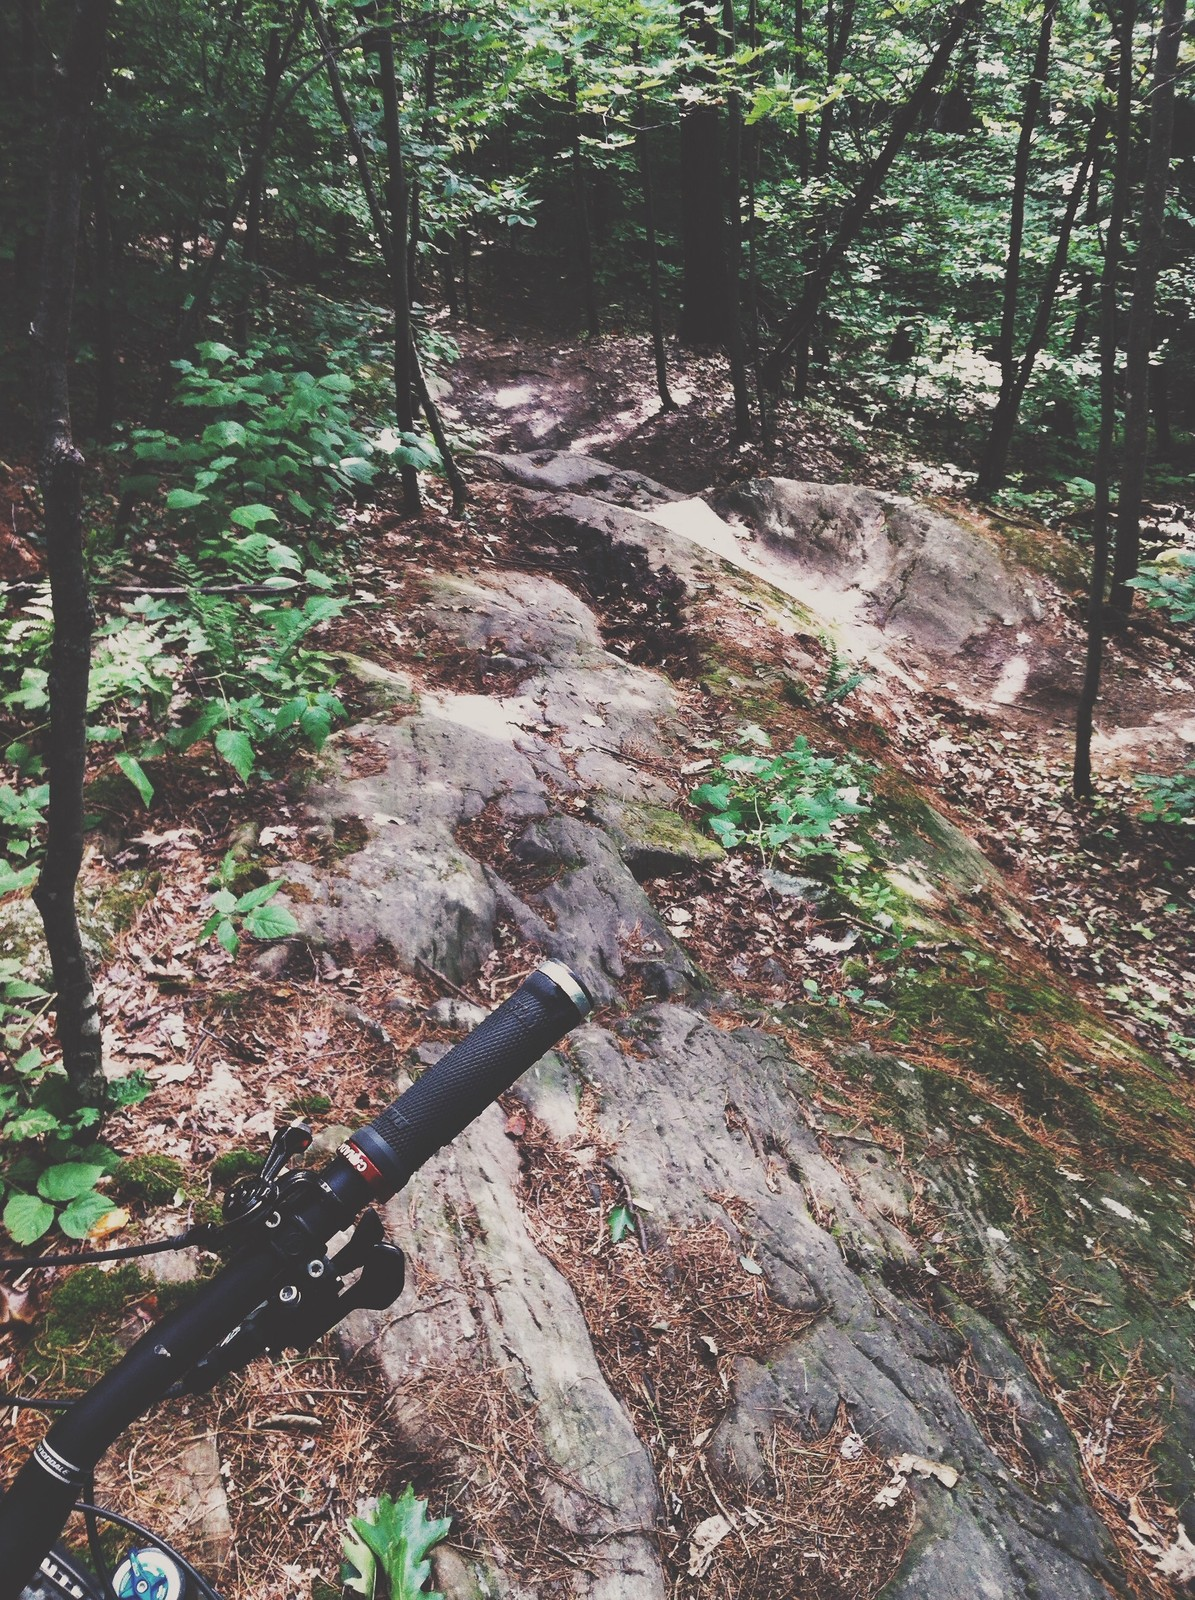 Montpelier, VT - Fusion - Mountain Biking Pictures - Vital MTB